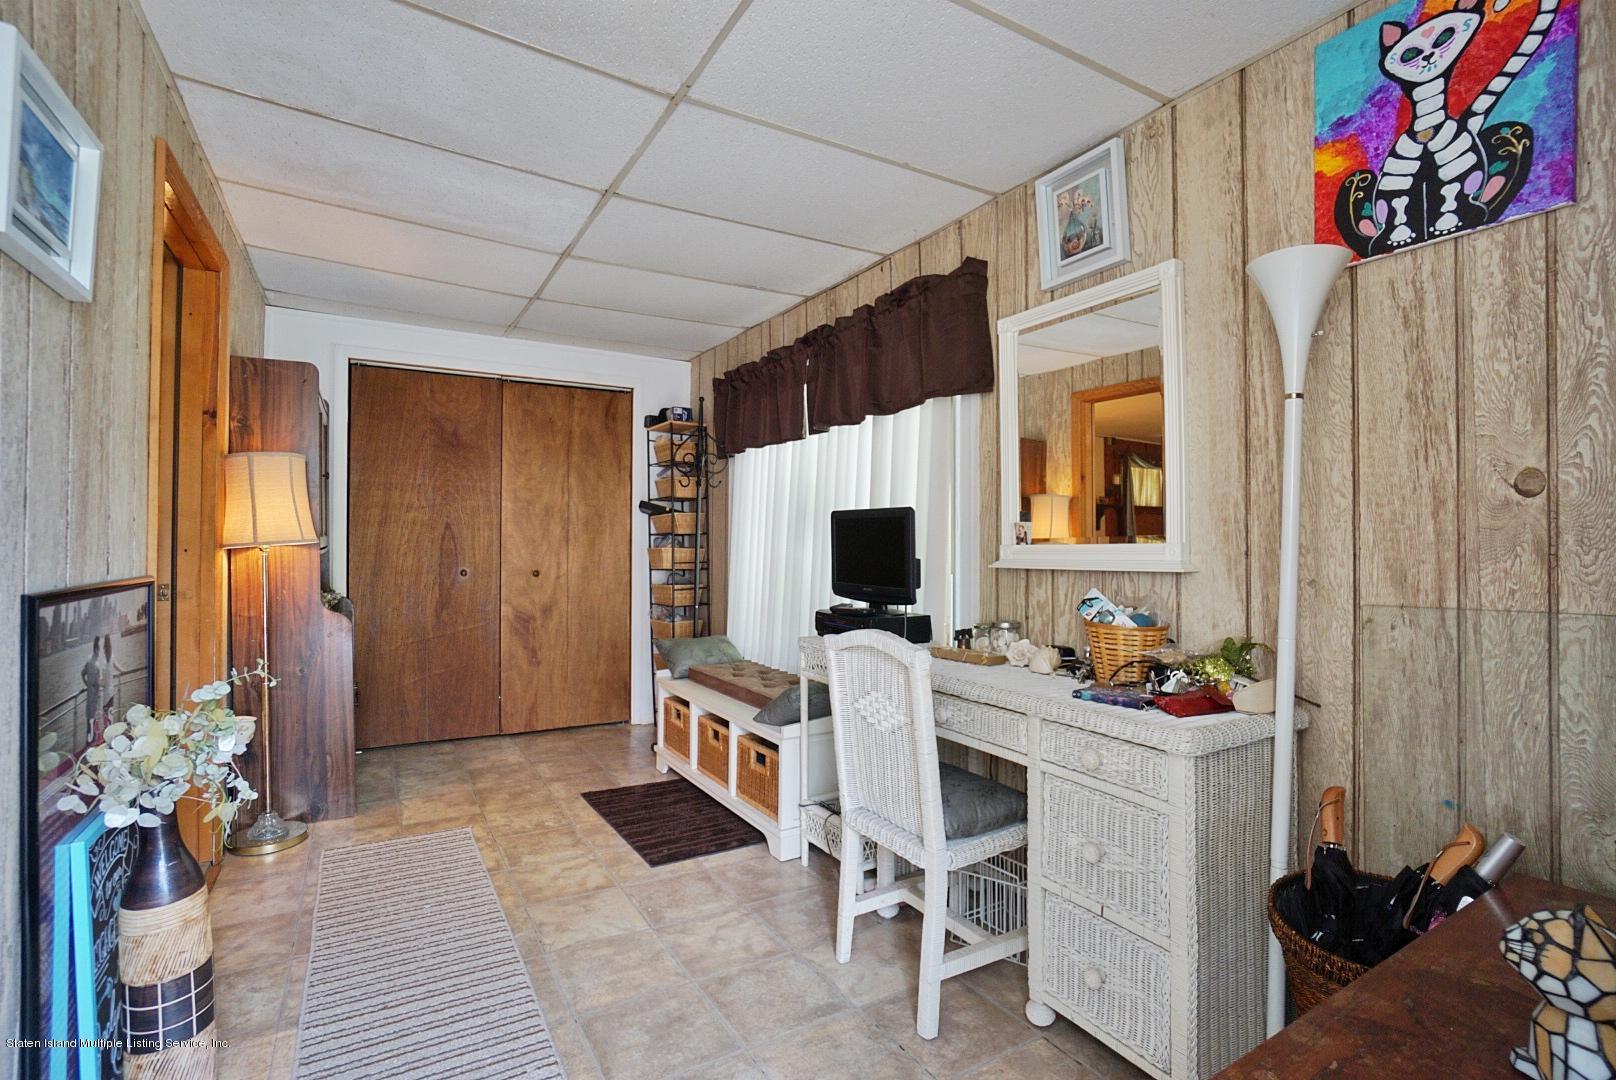 Single Family - Detached 42-44 Oceanic Avenue  Staten Island, NY 10312, MLS-1132674-2